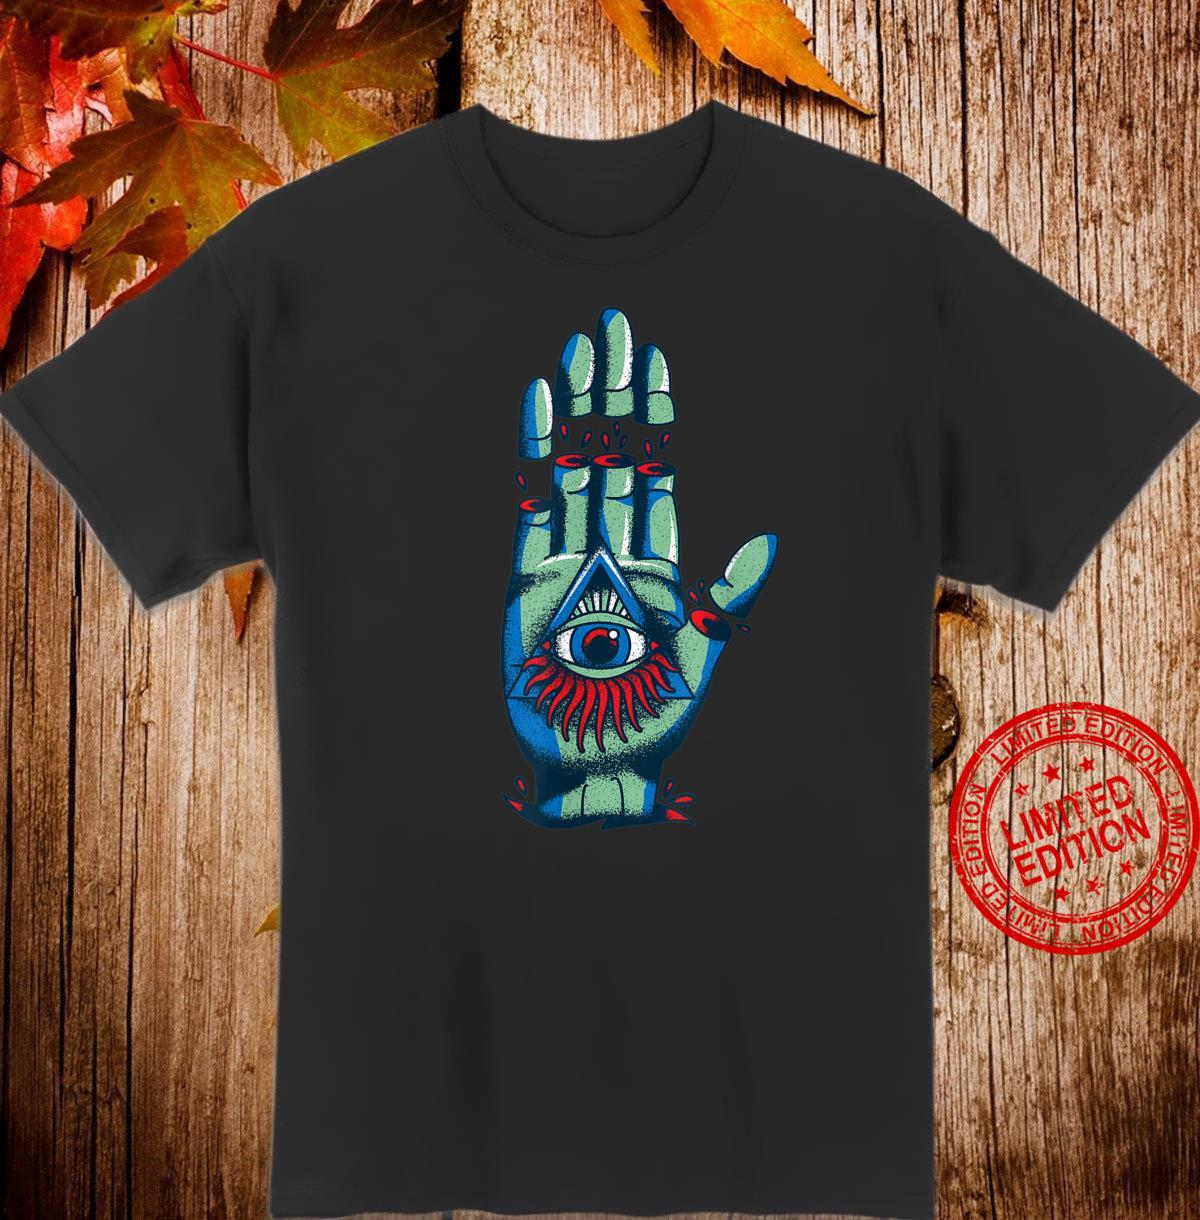 All Seeing Eye Illuminati Conspiracy Theory Vintage Shirt